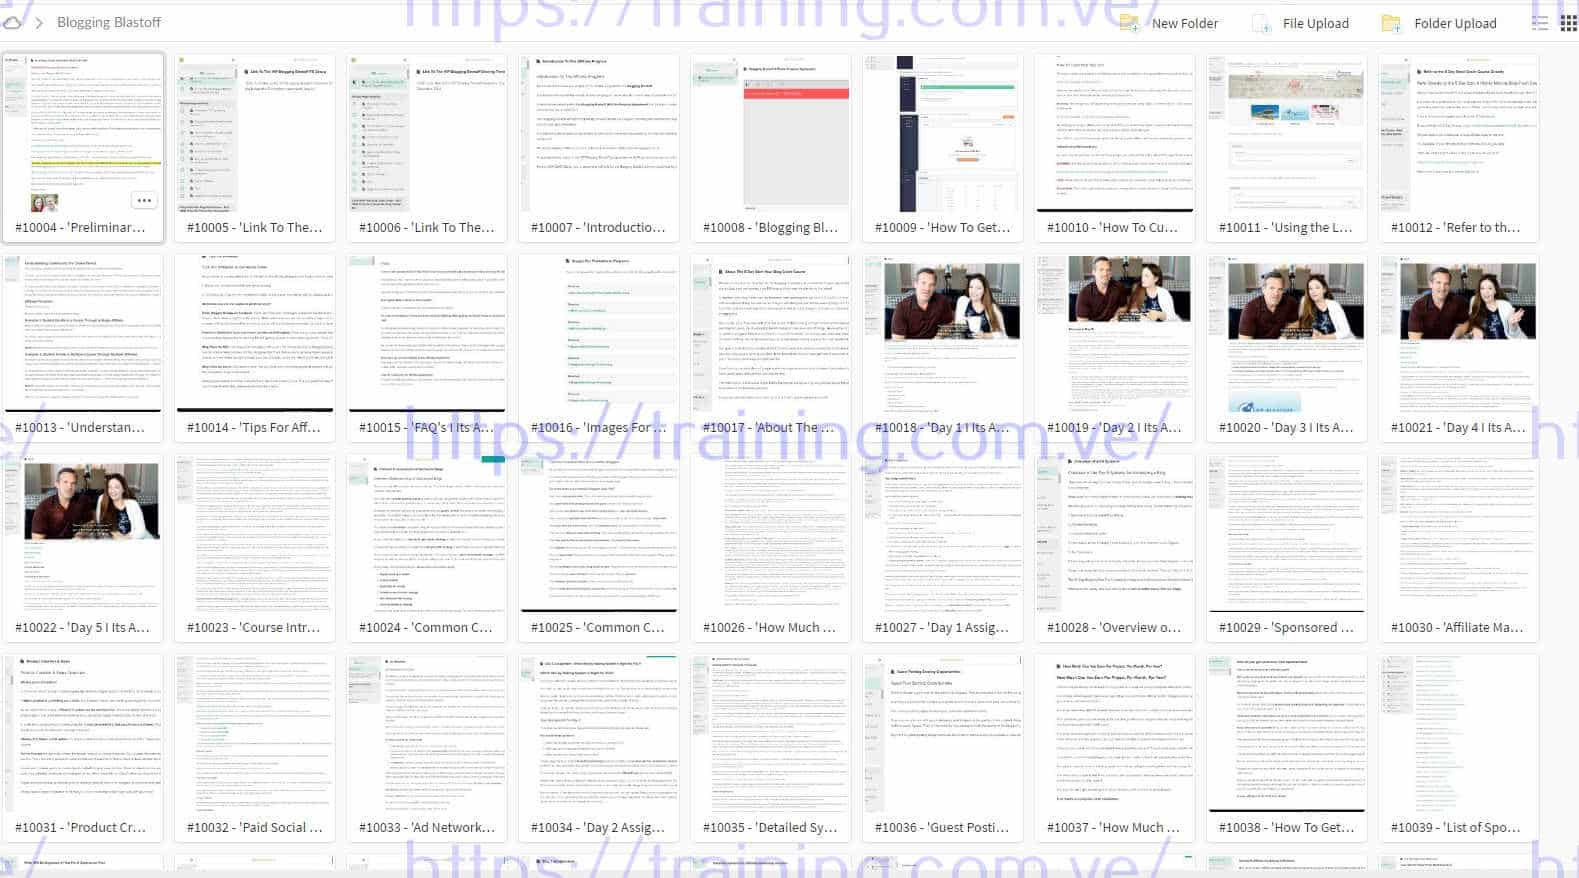 Blogging Blastoff by Heather Delaney Reese Torrent